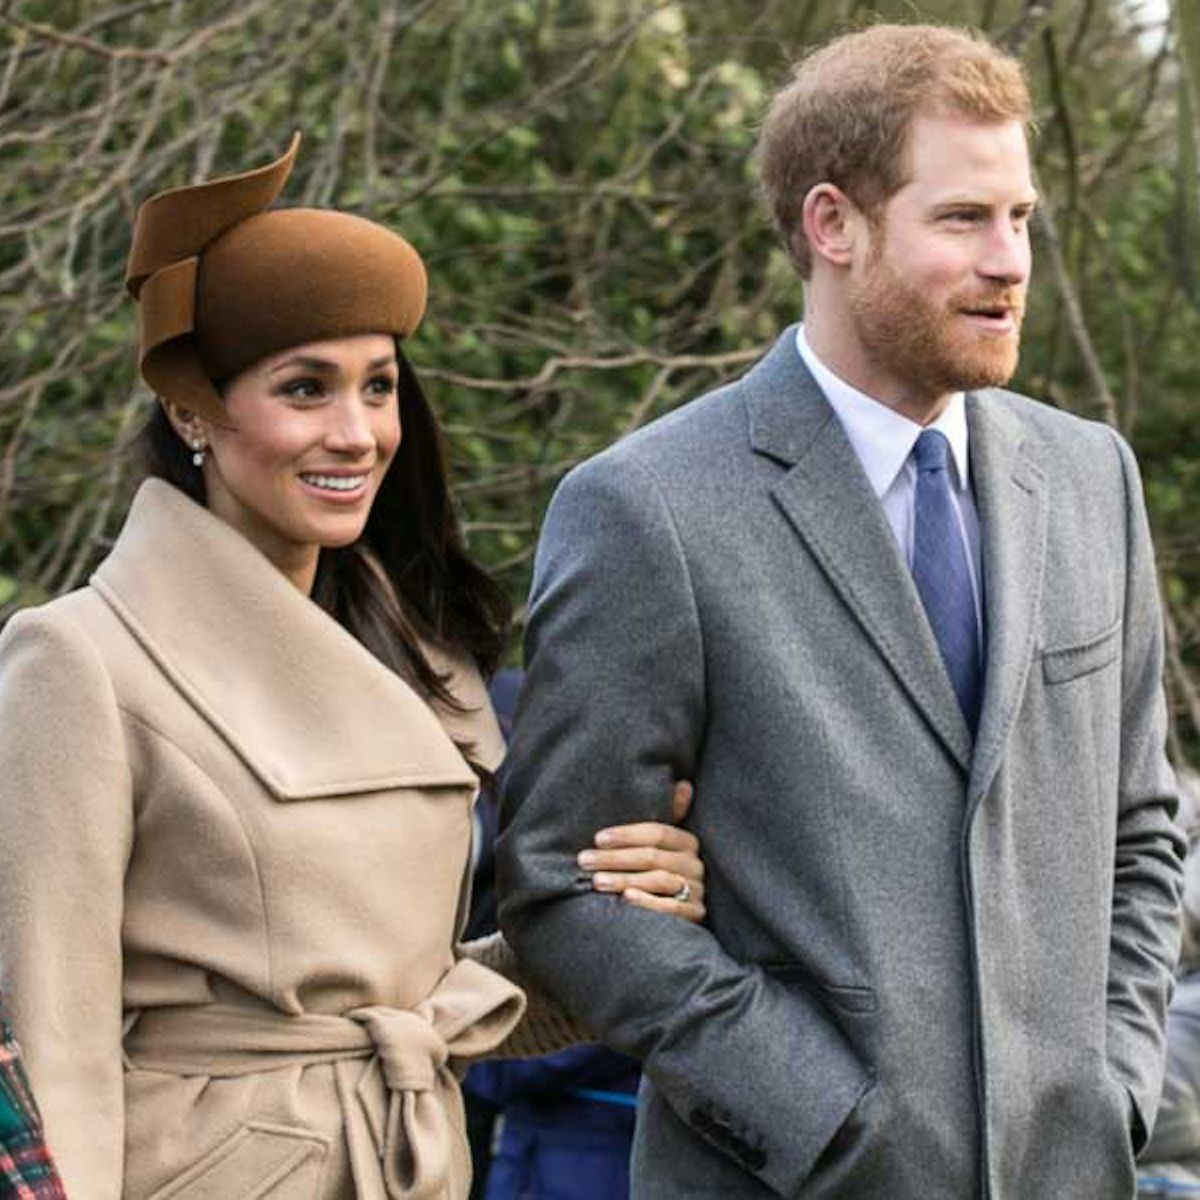 Did The Royal Wedding End Racism?